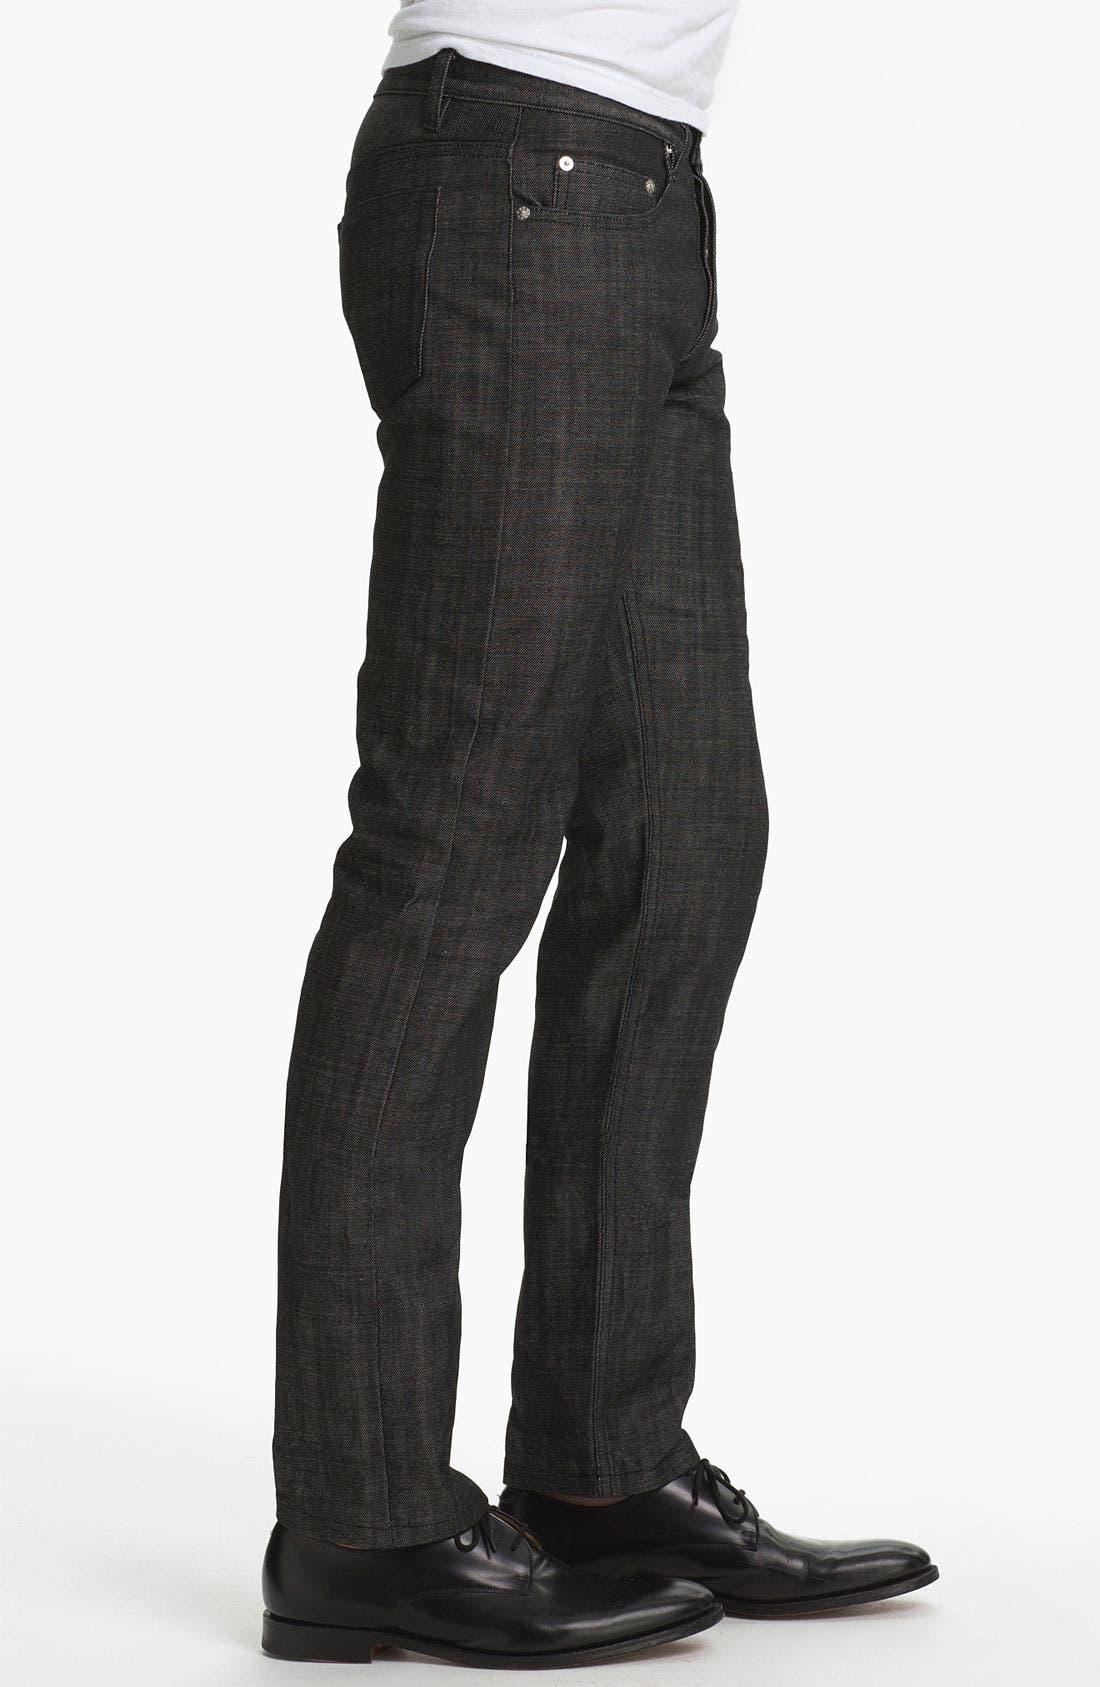 Alternate Image 3  - A.P.C. 'New Standard' Slim Straight Leg Jeans (Black) (Online Only)